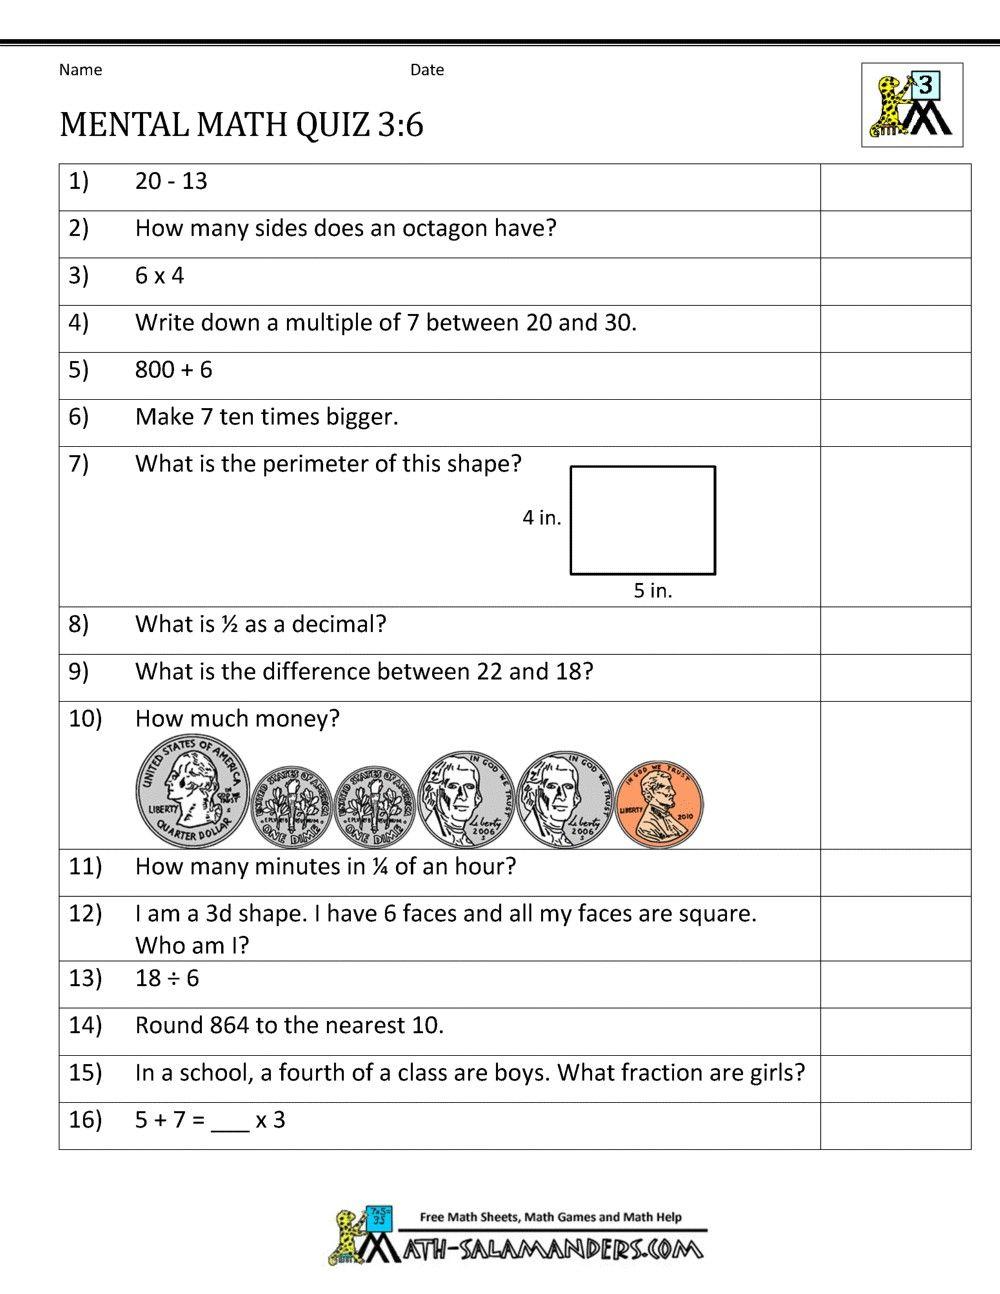 3 Worksheet Free Math Worksheets Third Grade 3 Measurement Units Of Length  Mental Math 3rd Gr...   Mental maths worksheets [ 1294 x 1000 Pixel ]